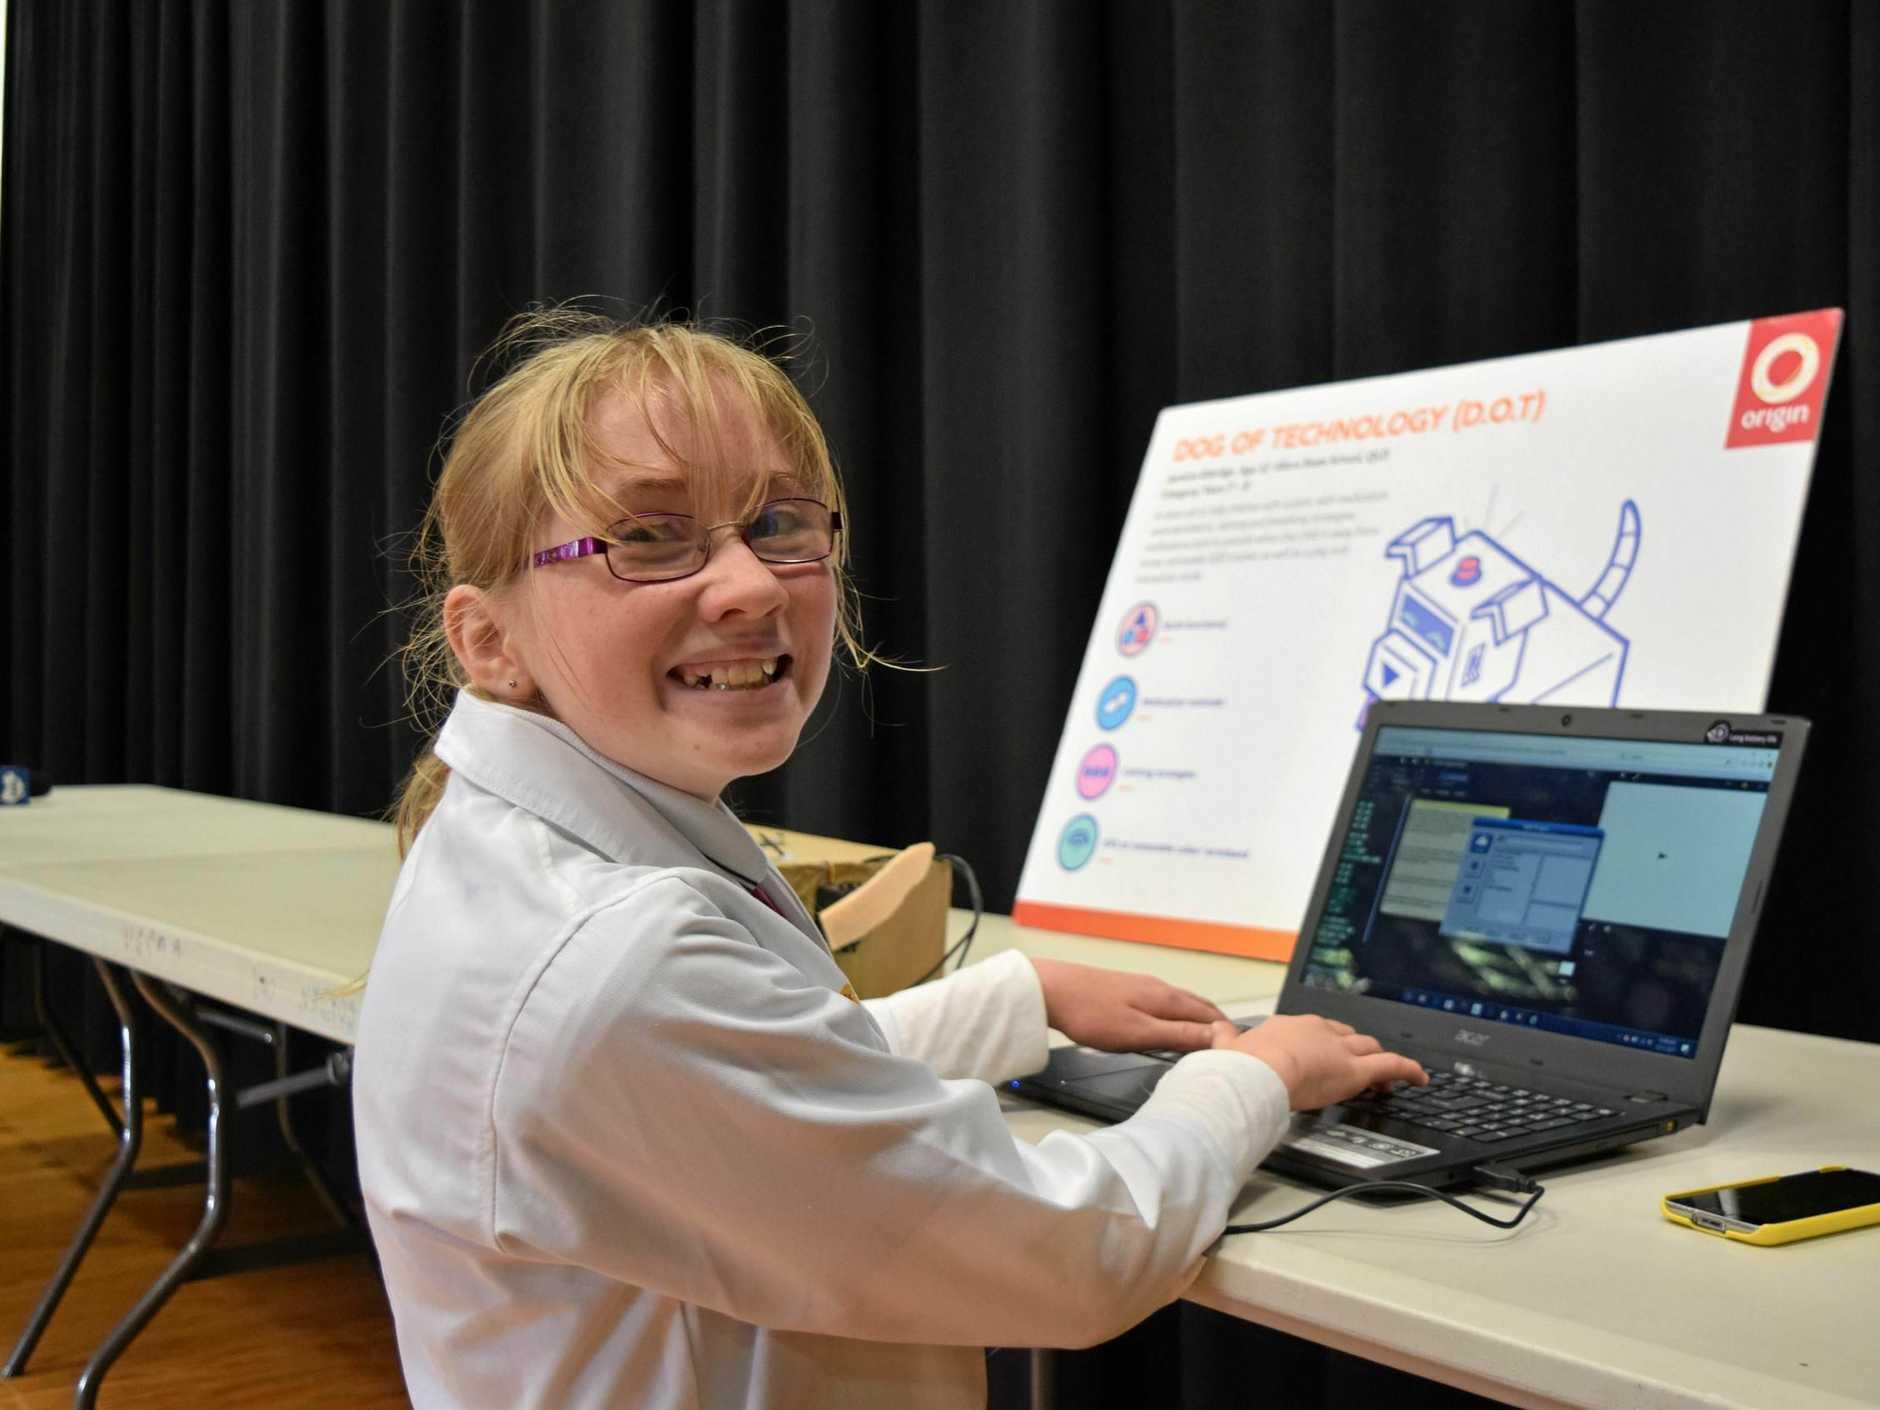 Jasmine Eldridge is off to NASA after winning a national Origin Energy competition.